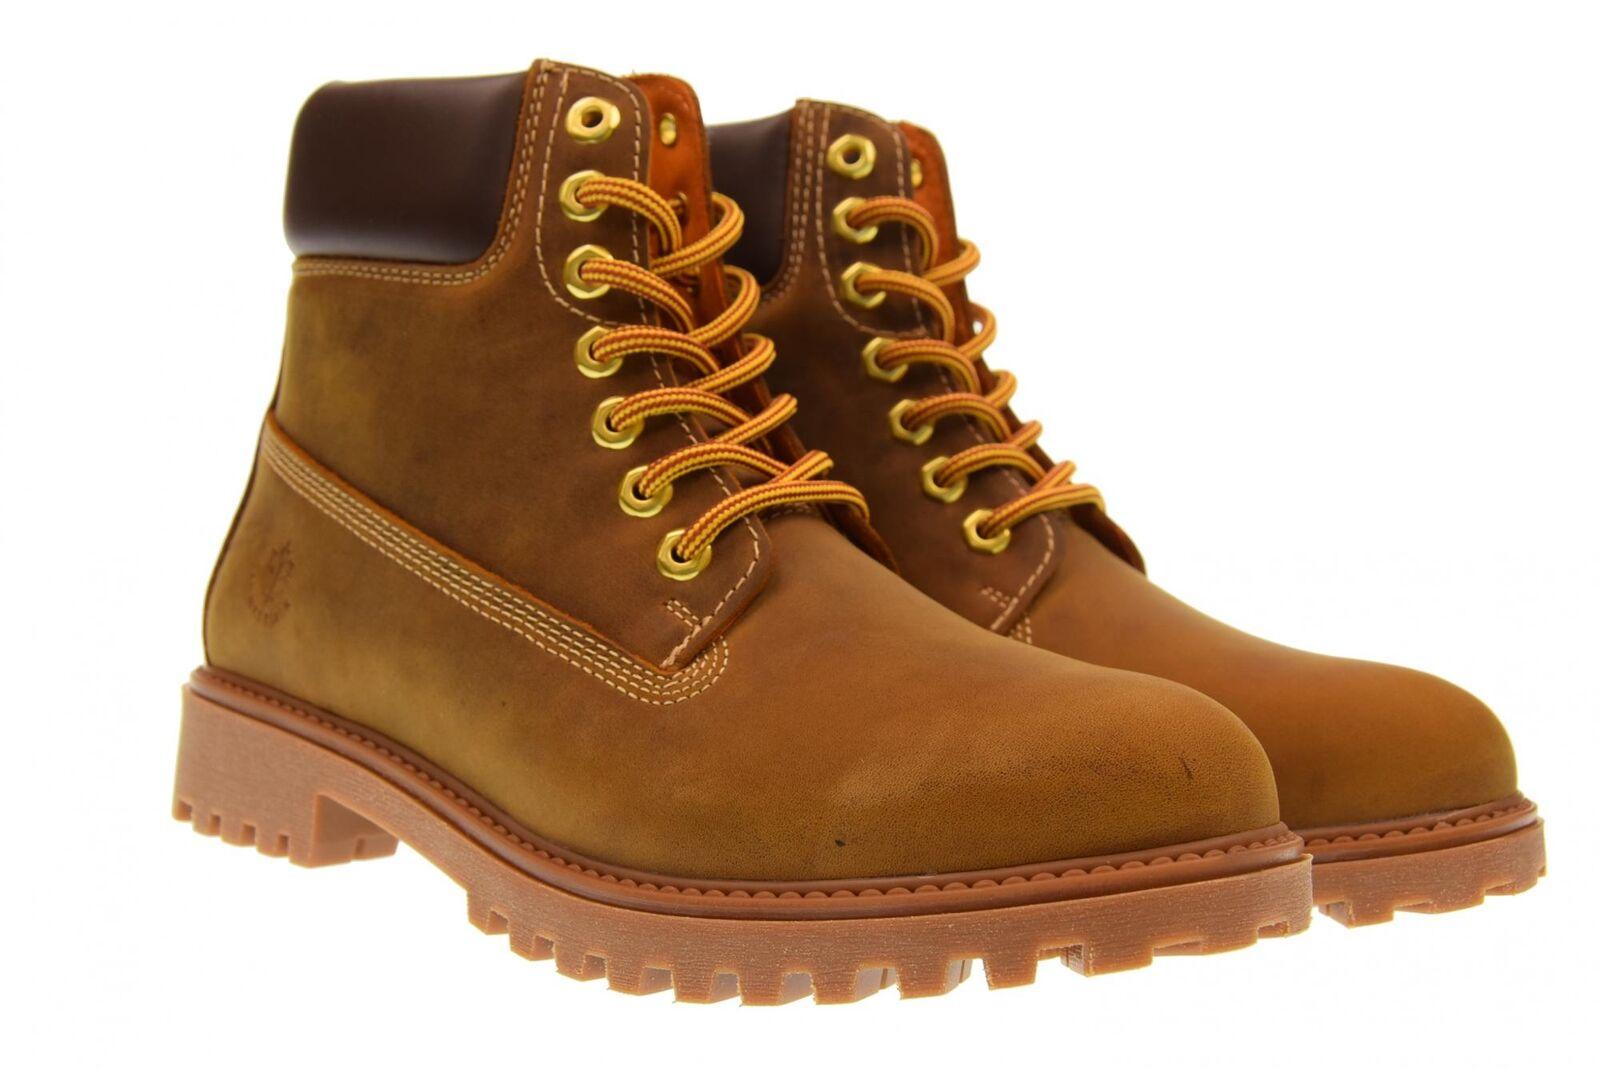 Lumberjack scarpe H01-M0001 uomo scarponcini RIVER SM00101-019 H01-M0001 scarpe A18 f99d43